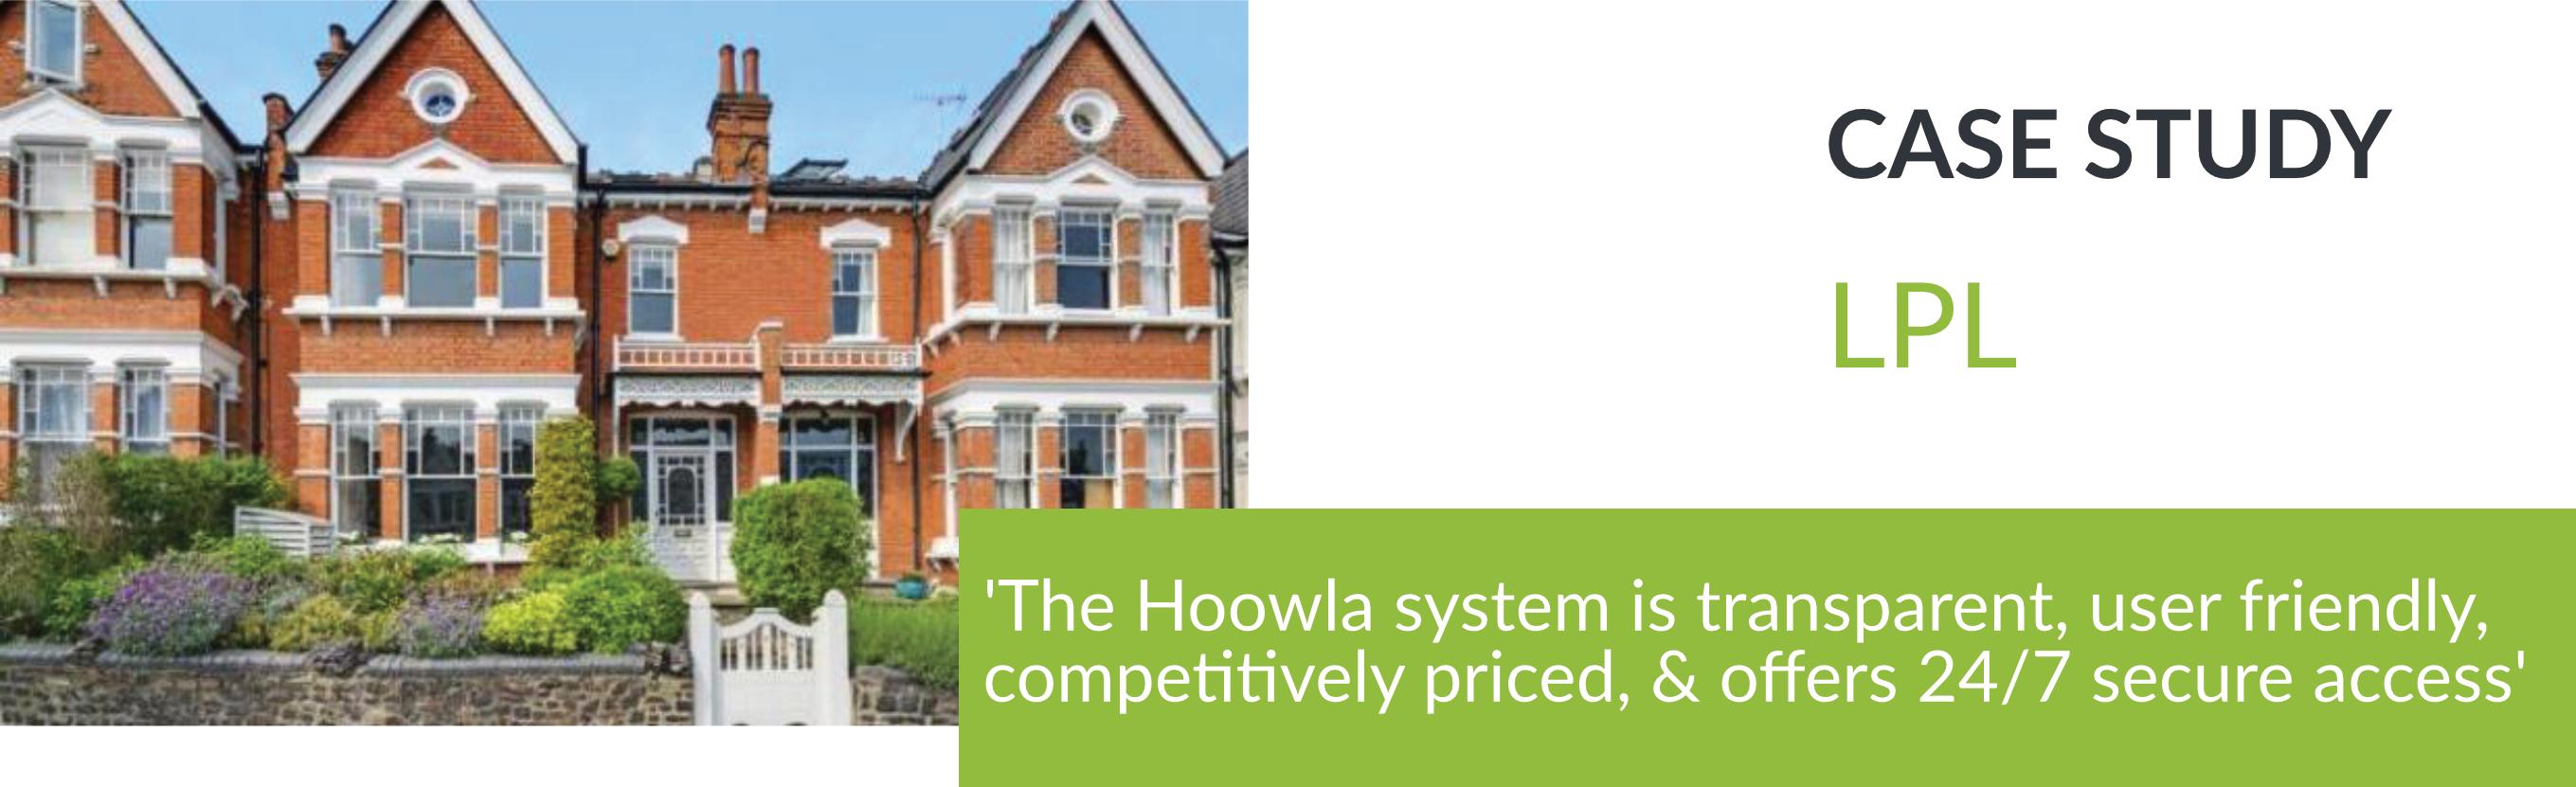 Hoowla Review LPL Case Study